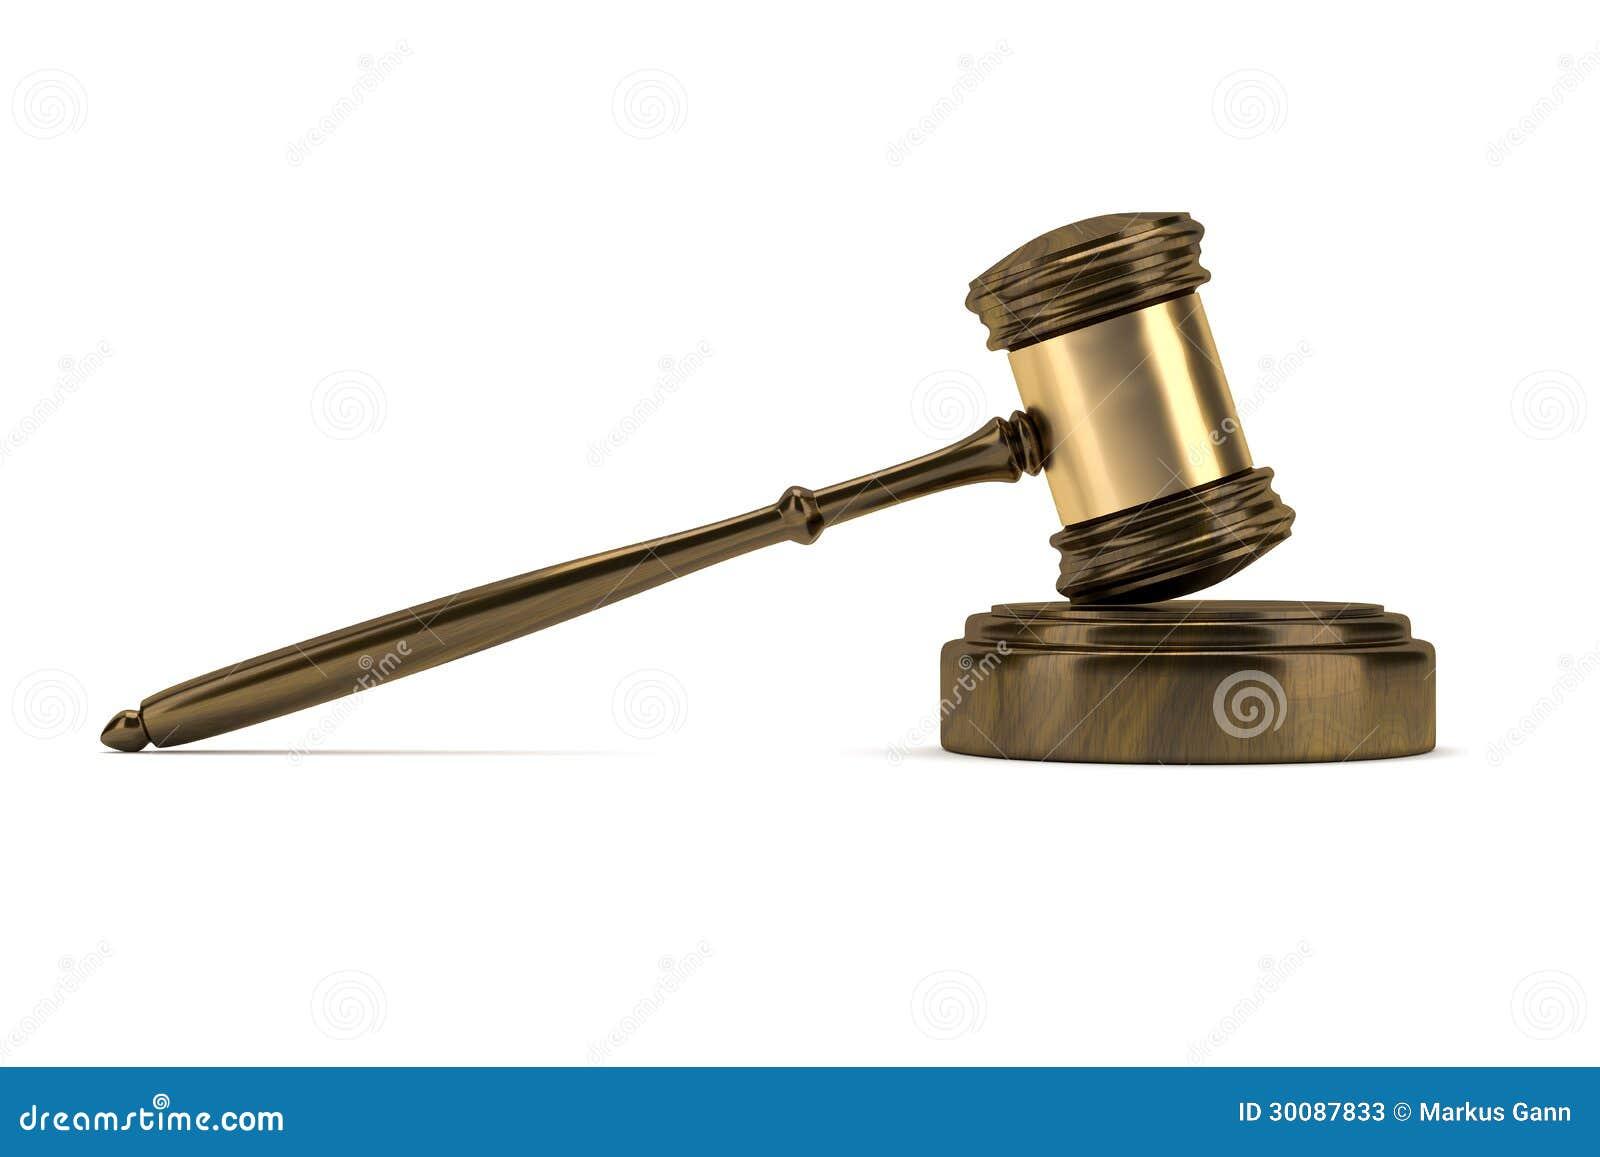 judge gavel - DriverLayer Search Engine